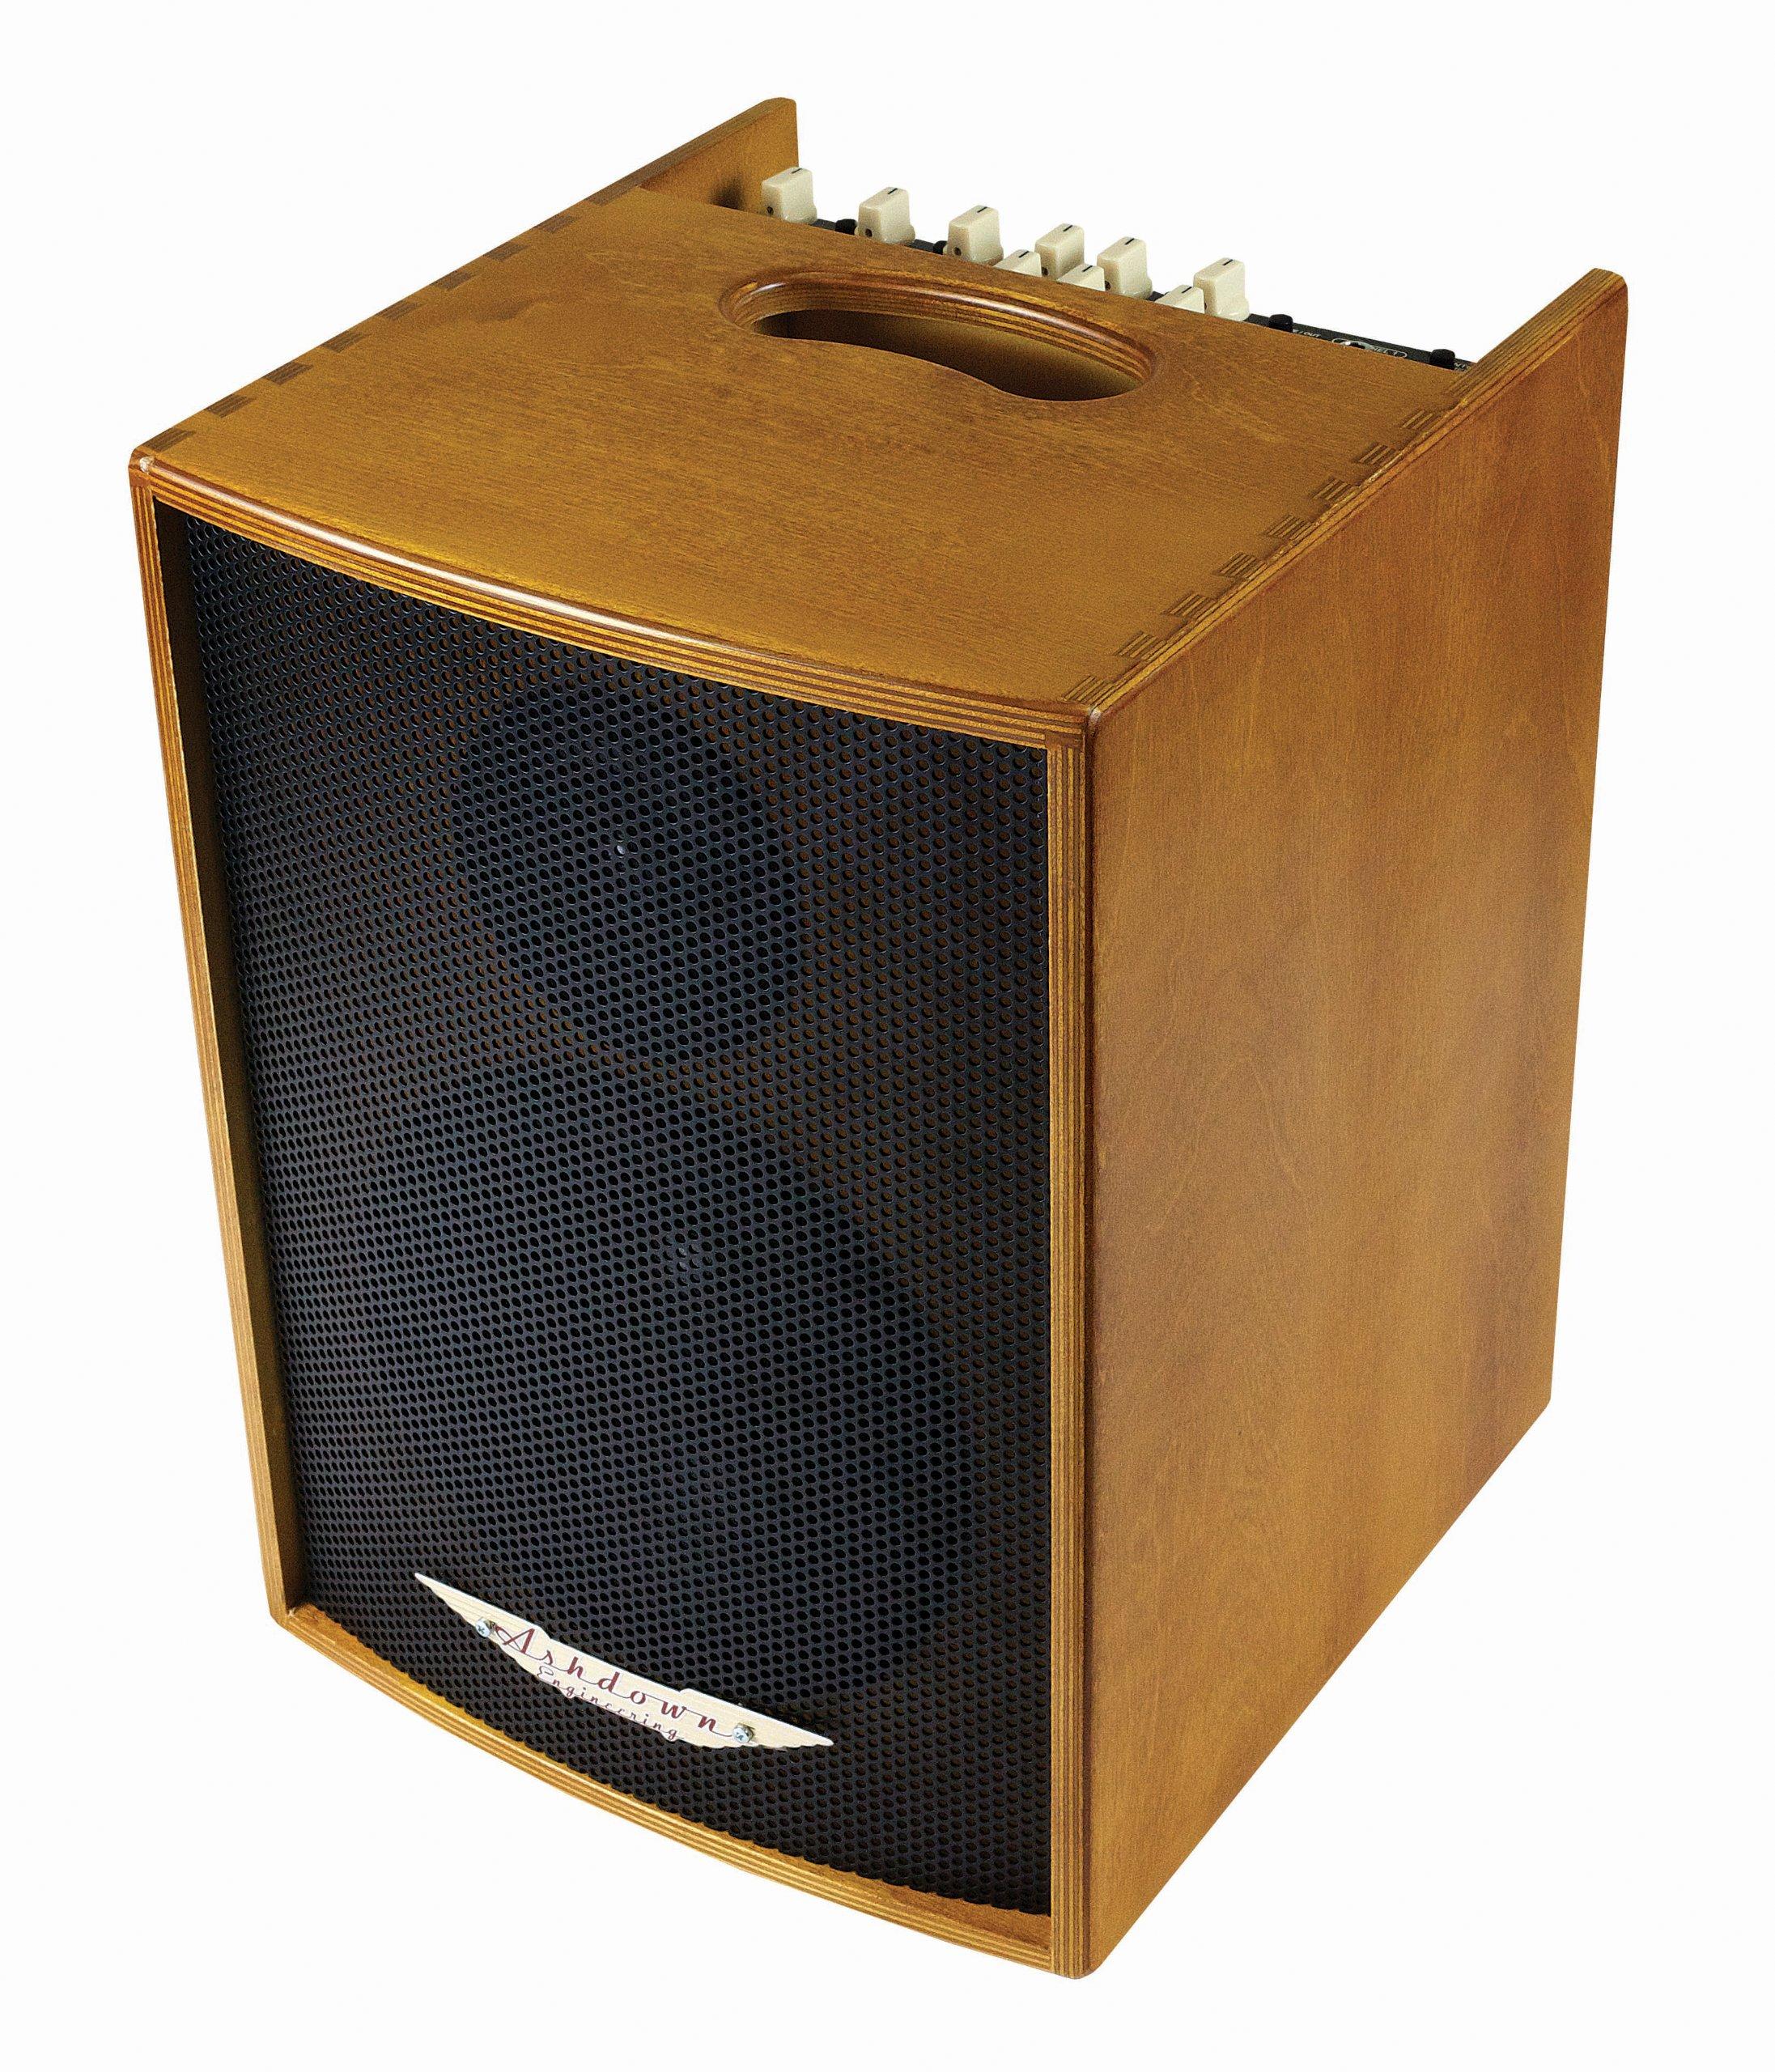 ashdown acoustic 100 video ashdown aa 100 acoustic guitar amplifier with adrian legg sebdog. Black Bedroom Furniture Sets. Home Design Ideas